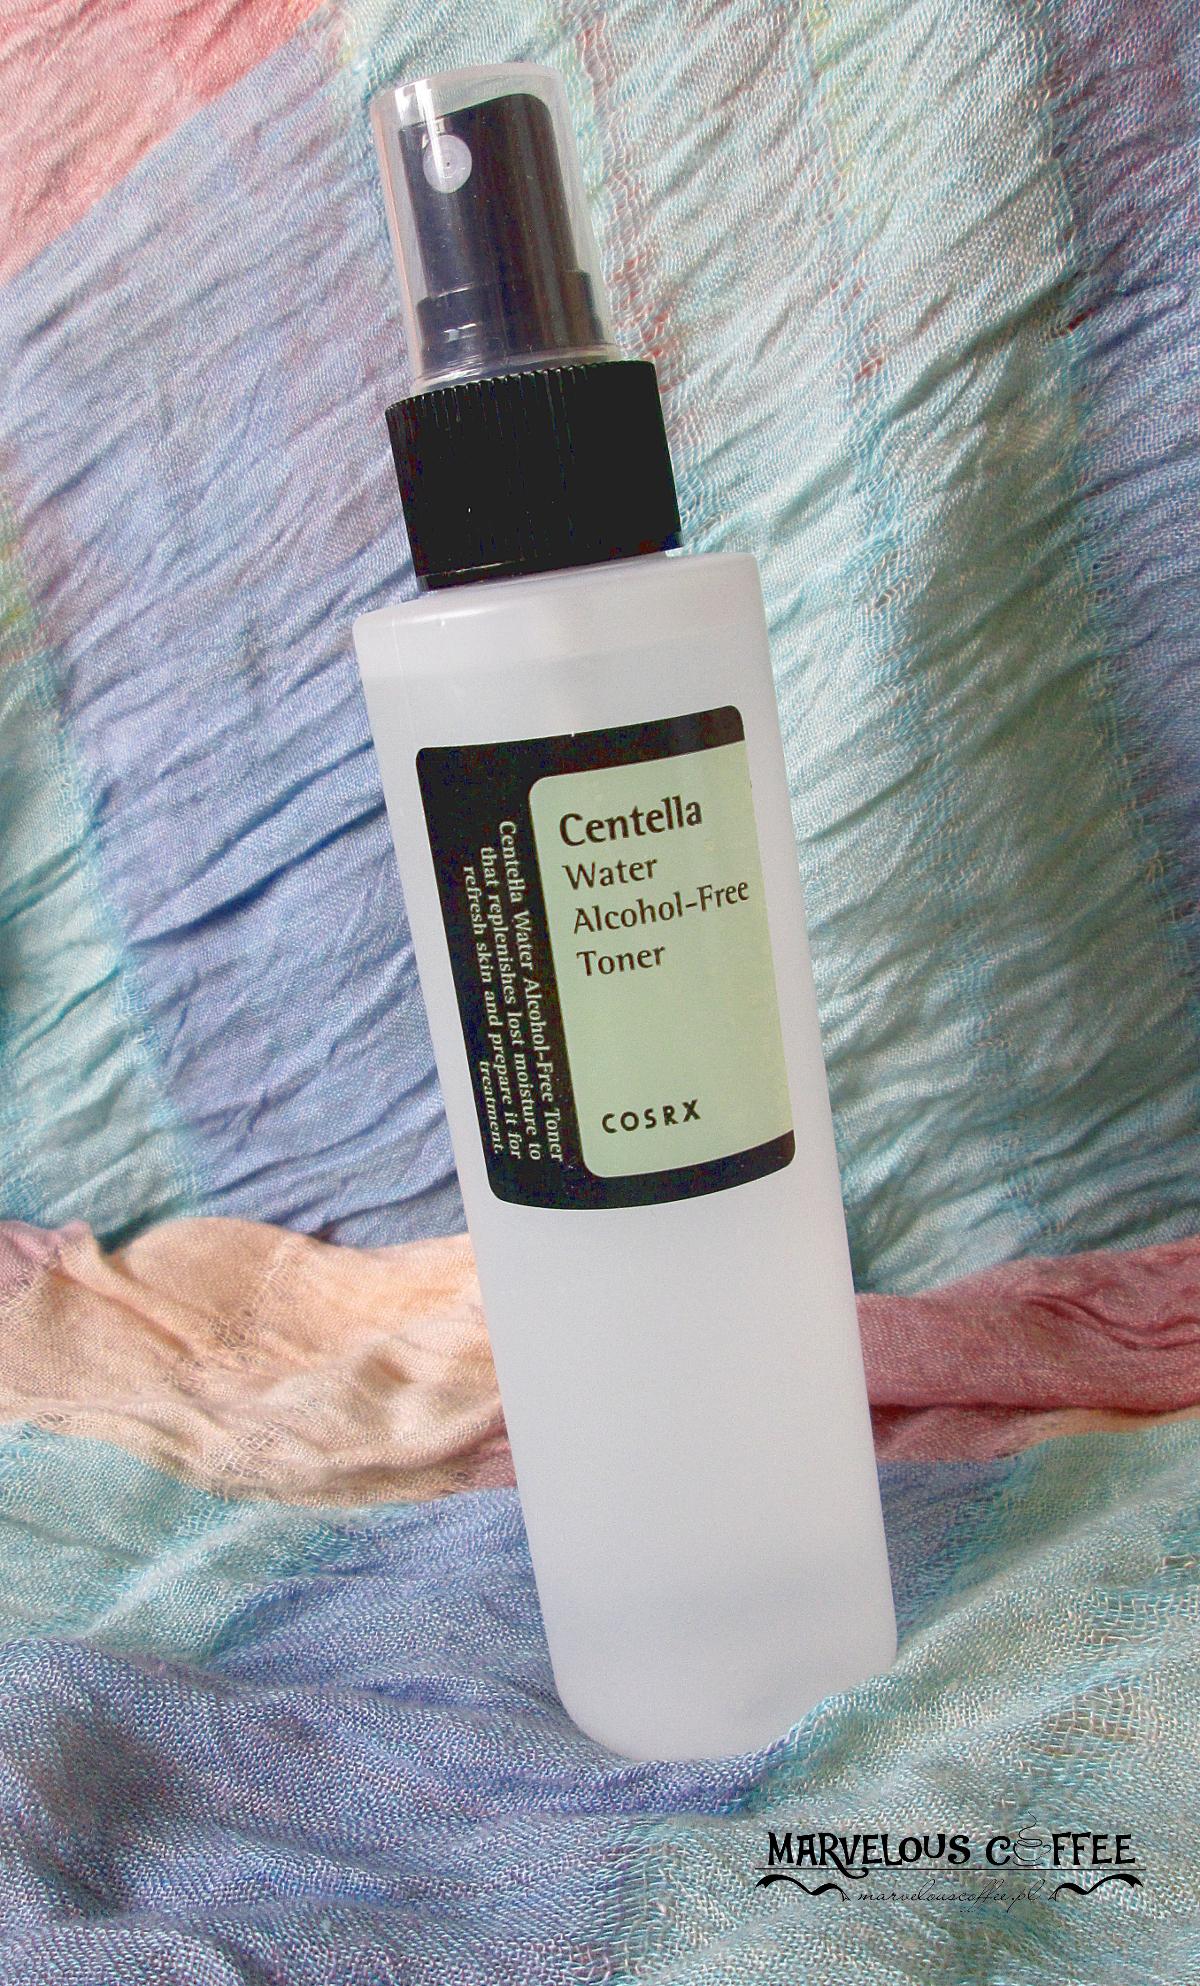 COSRX Centella Water Alcohol Free Toner